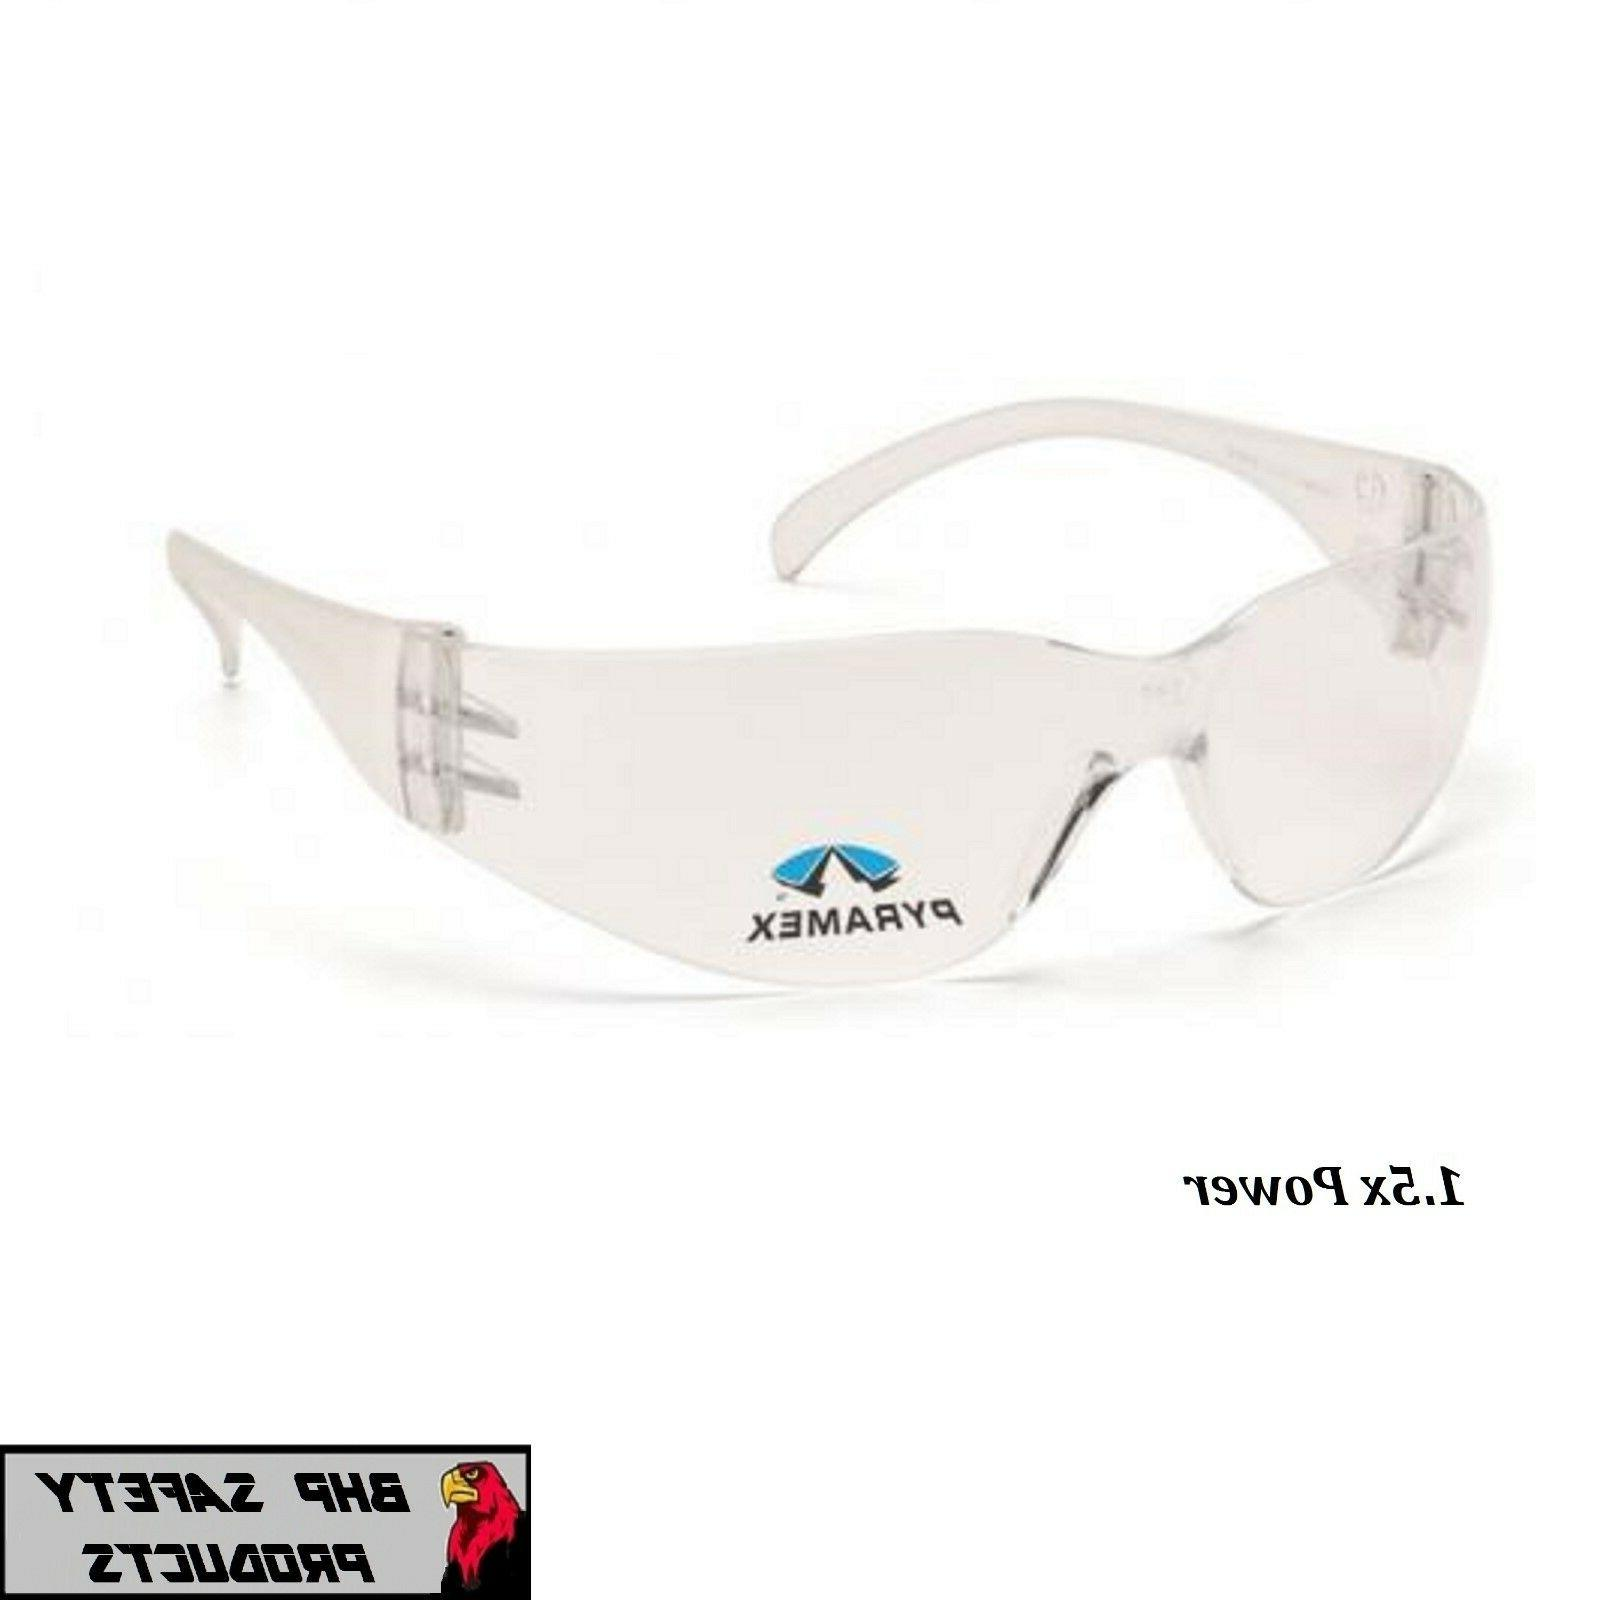 PYRAMEX INTRUDER READER SAFETY GLASSES BIFOCAL CLEAR 1.5 LEN